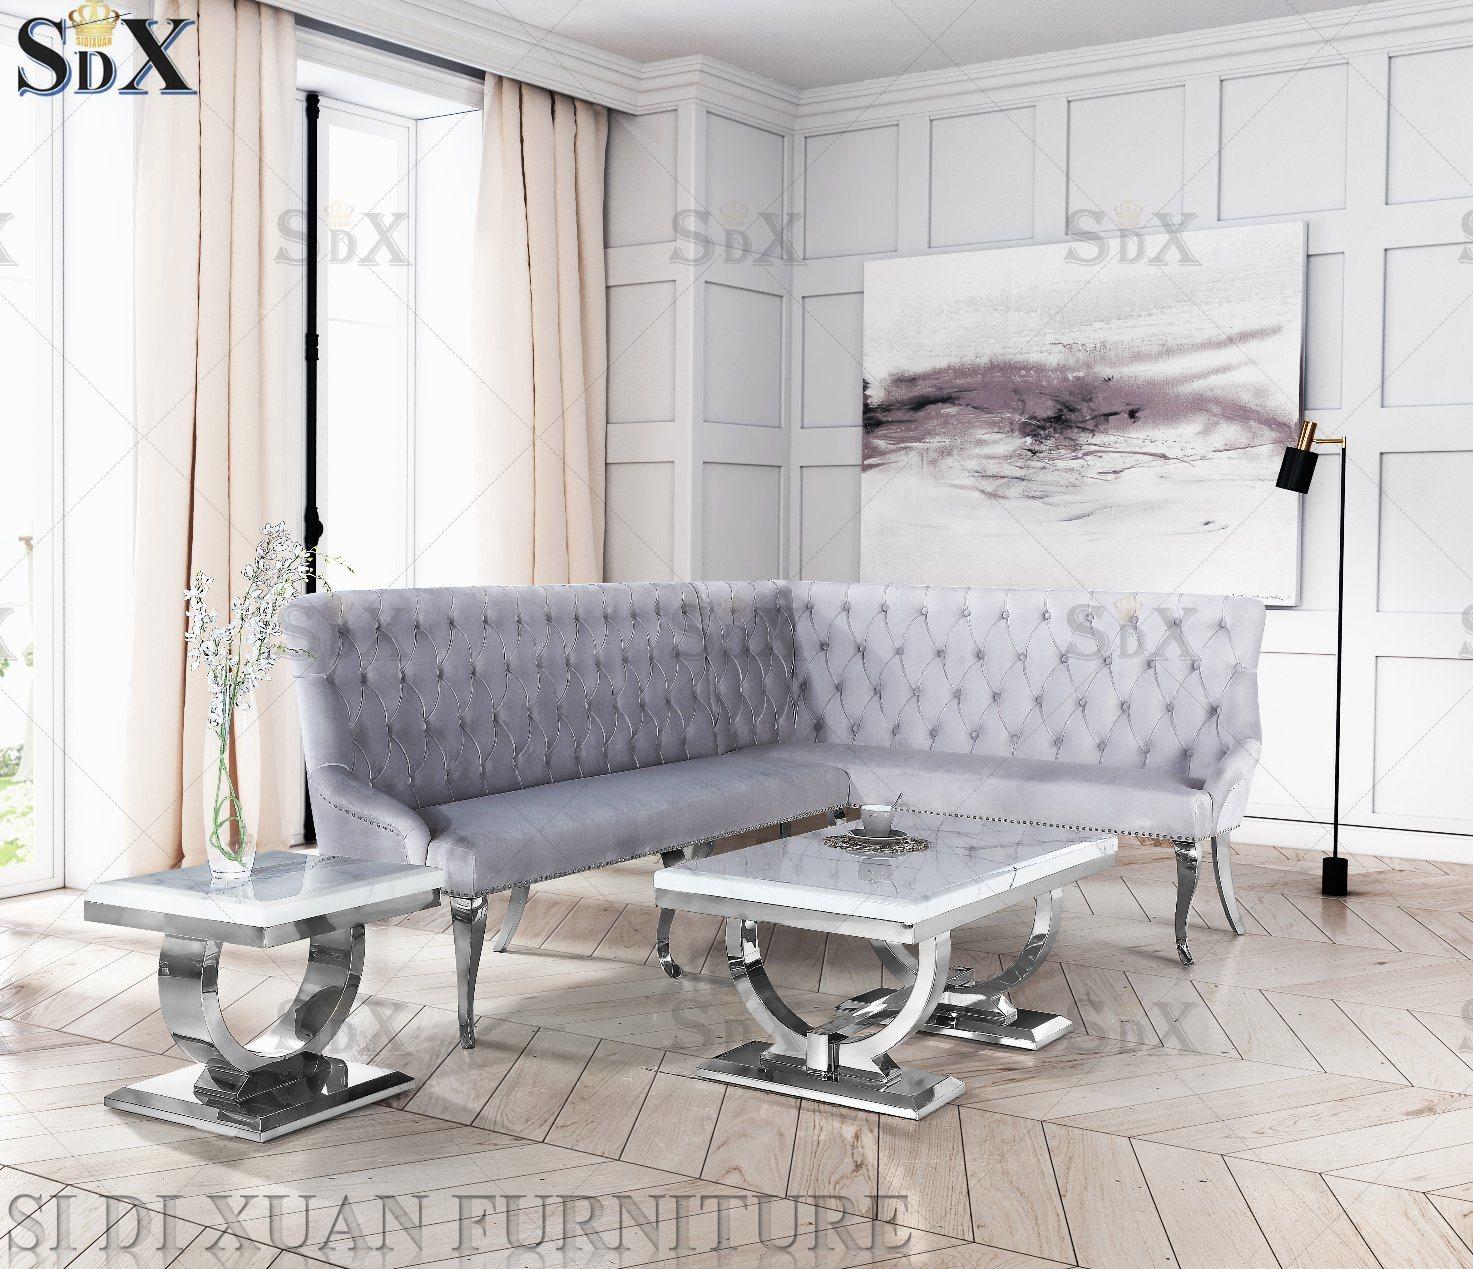 [Hot Item] Stainless Steel Modern Italian Living Room Sofa Tea Table /  Circle Leg Glass Coffee Table